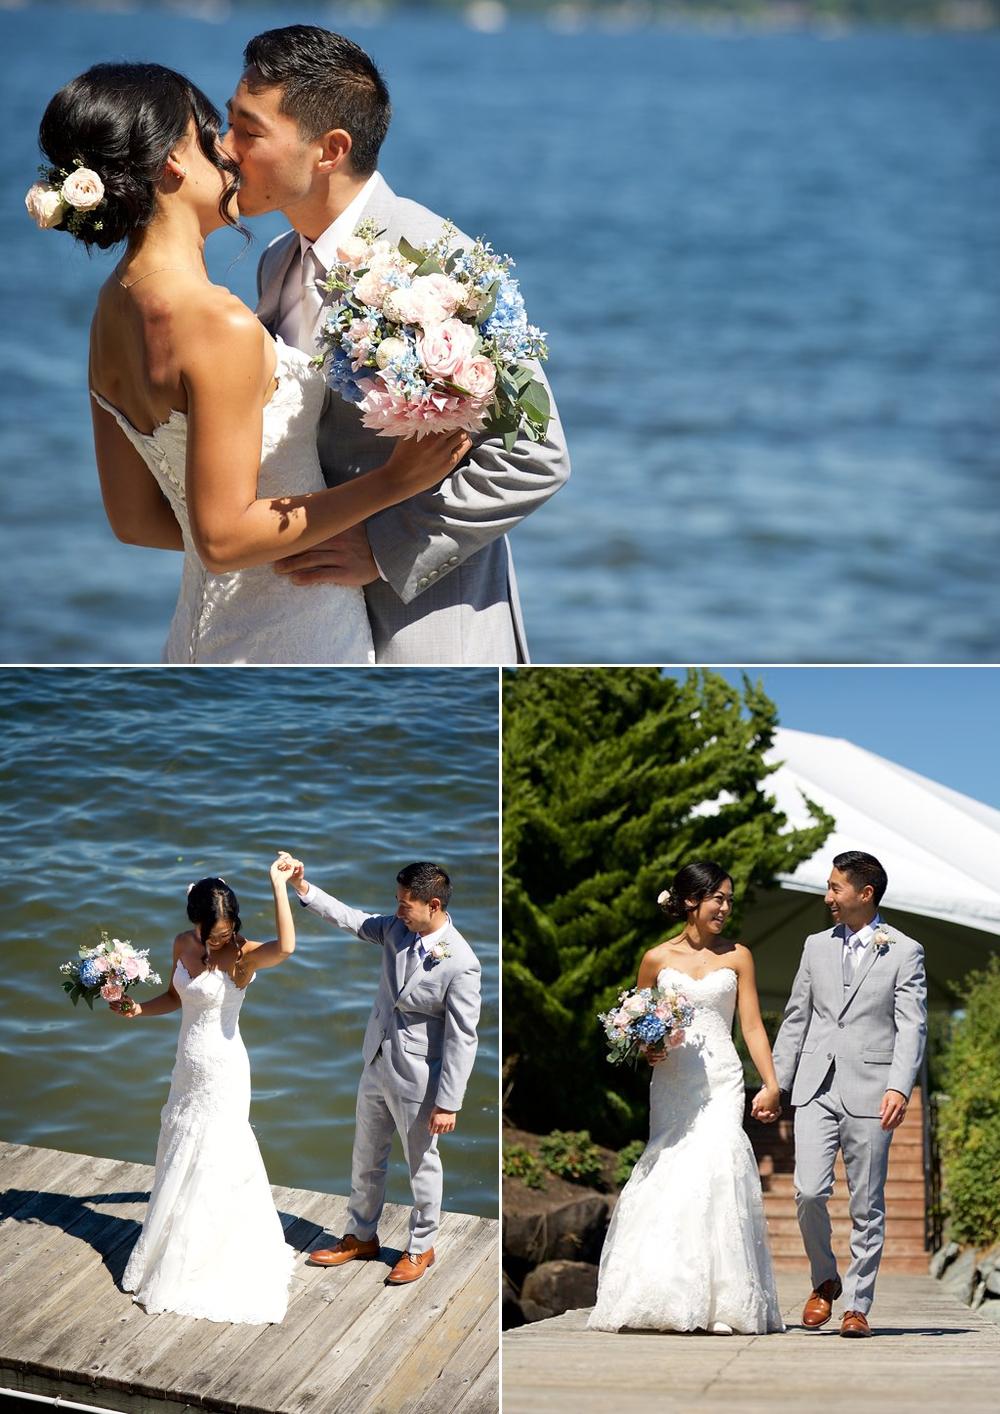 blue-and-blush-wedding-seattle-tennis-club 7.jpg